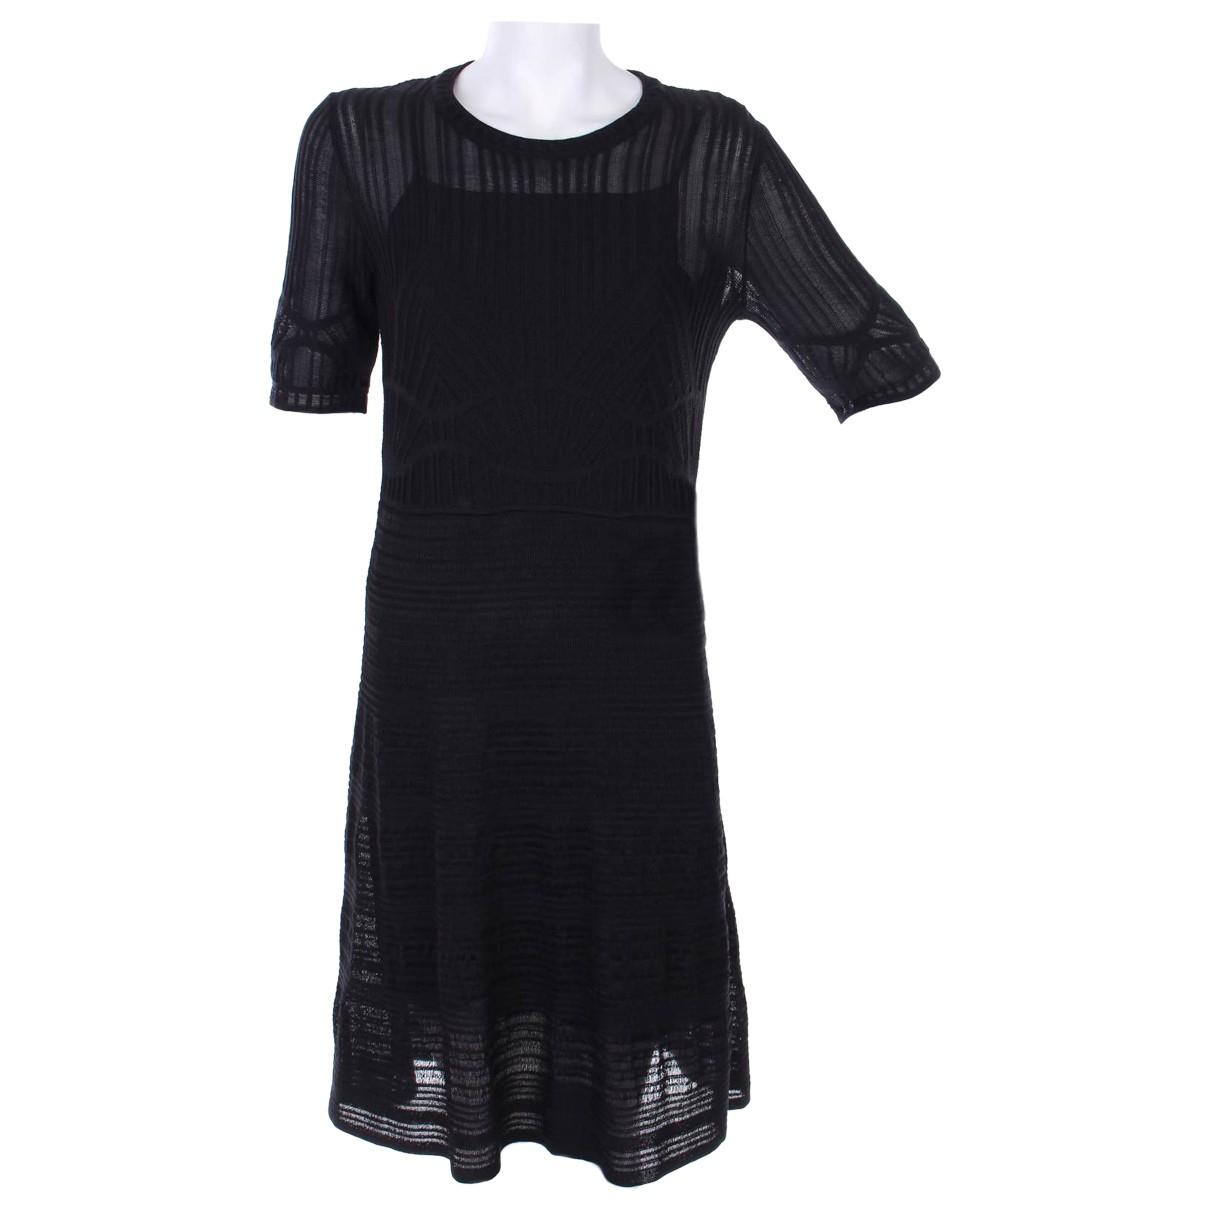 M Missoni \N Black Cotton dress for Women 44 FR